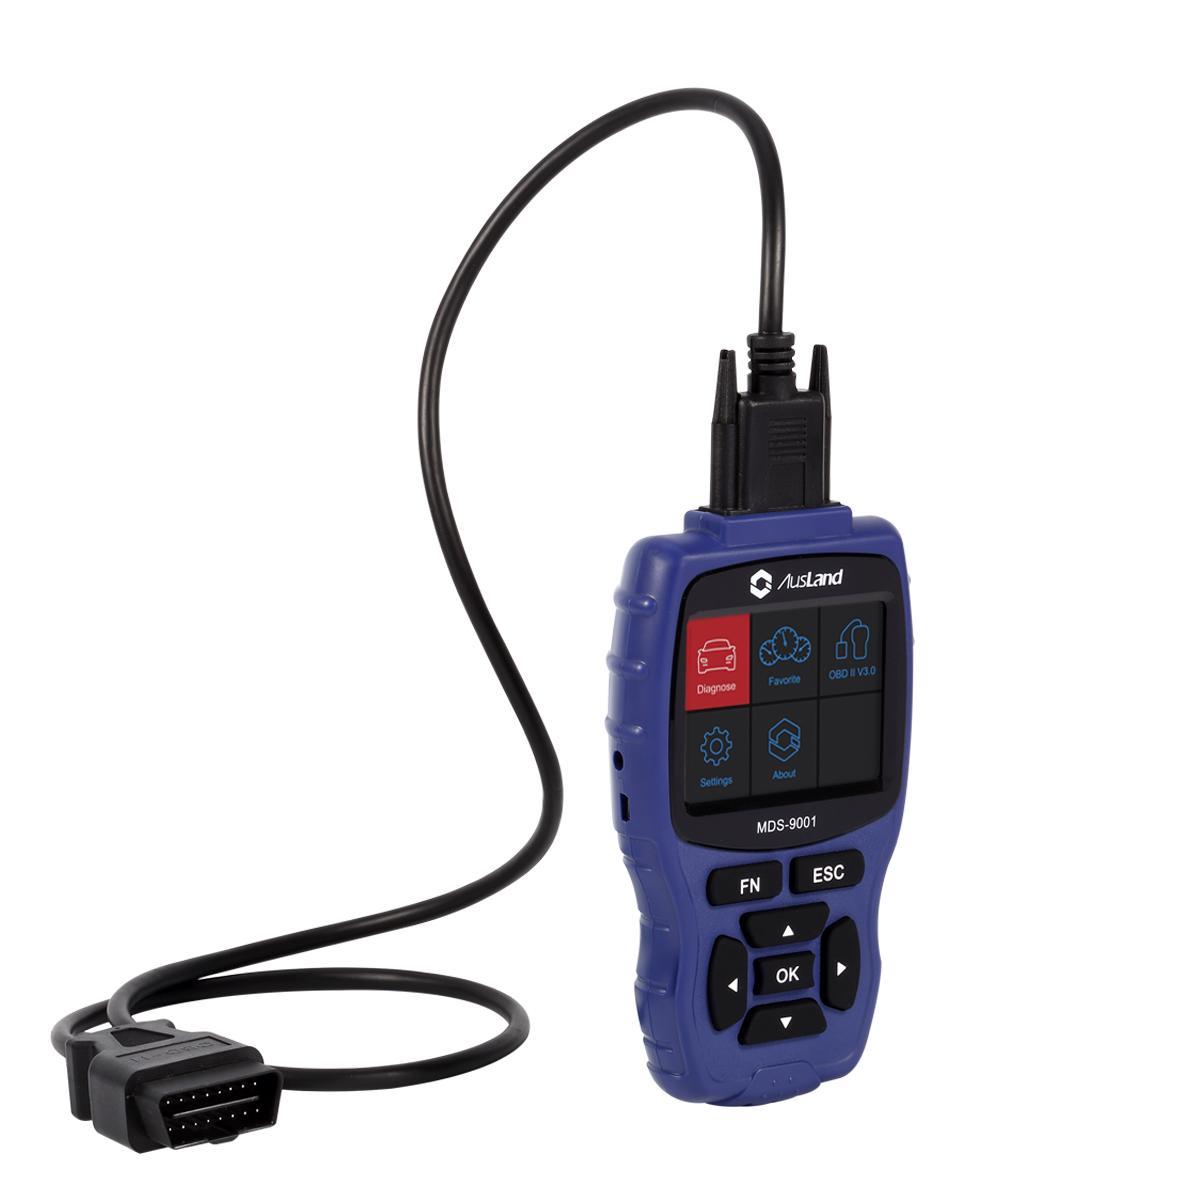 AUSLAND MDS-9001 Multi-Diag Specialist Handheld Car Diagnostic Scan Tool  ECU Programming Tool for L-A-N-D-R-O-V-E-R, View car diagnostic scanner,